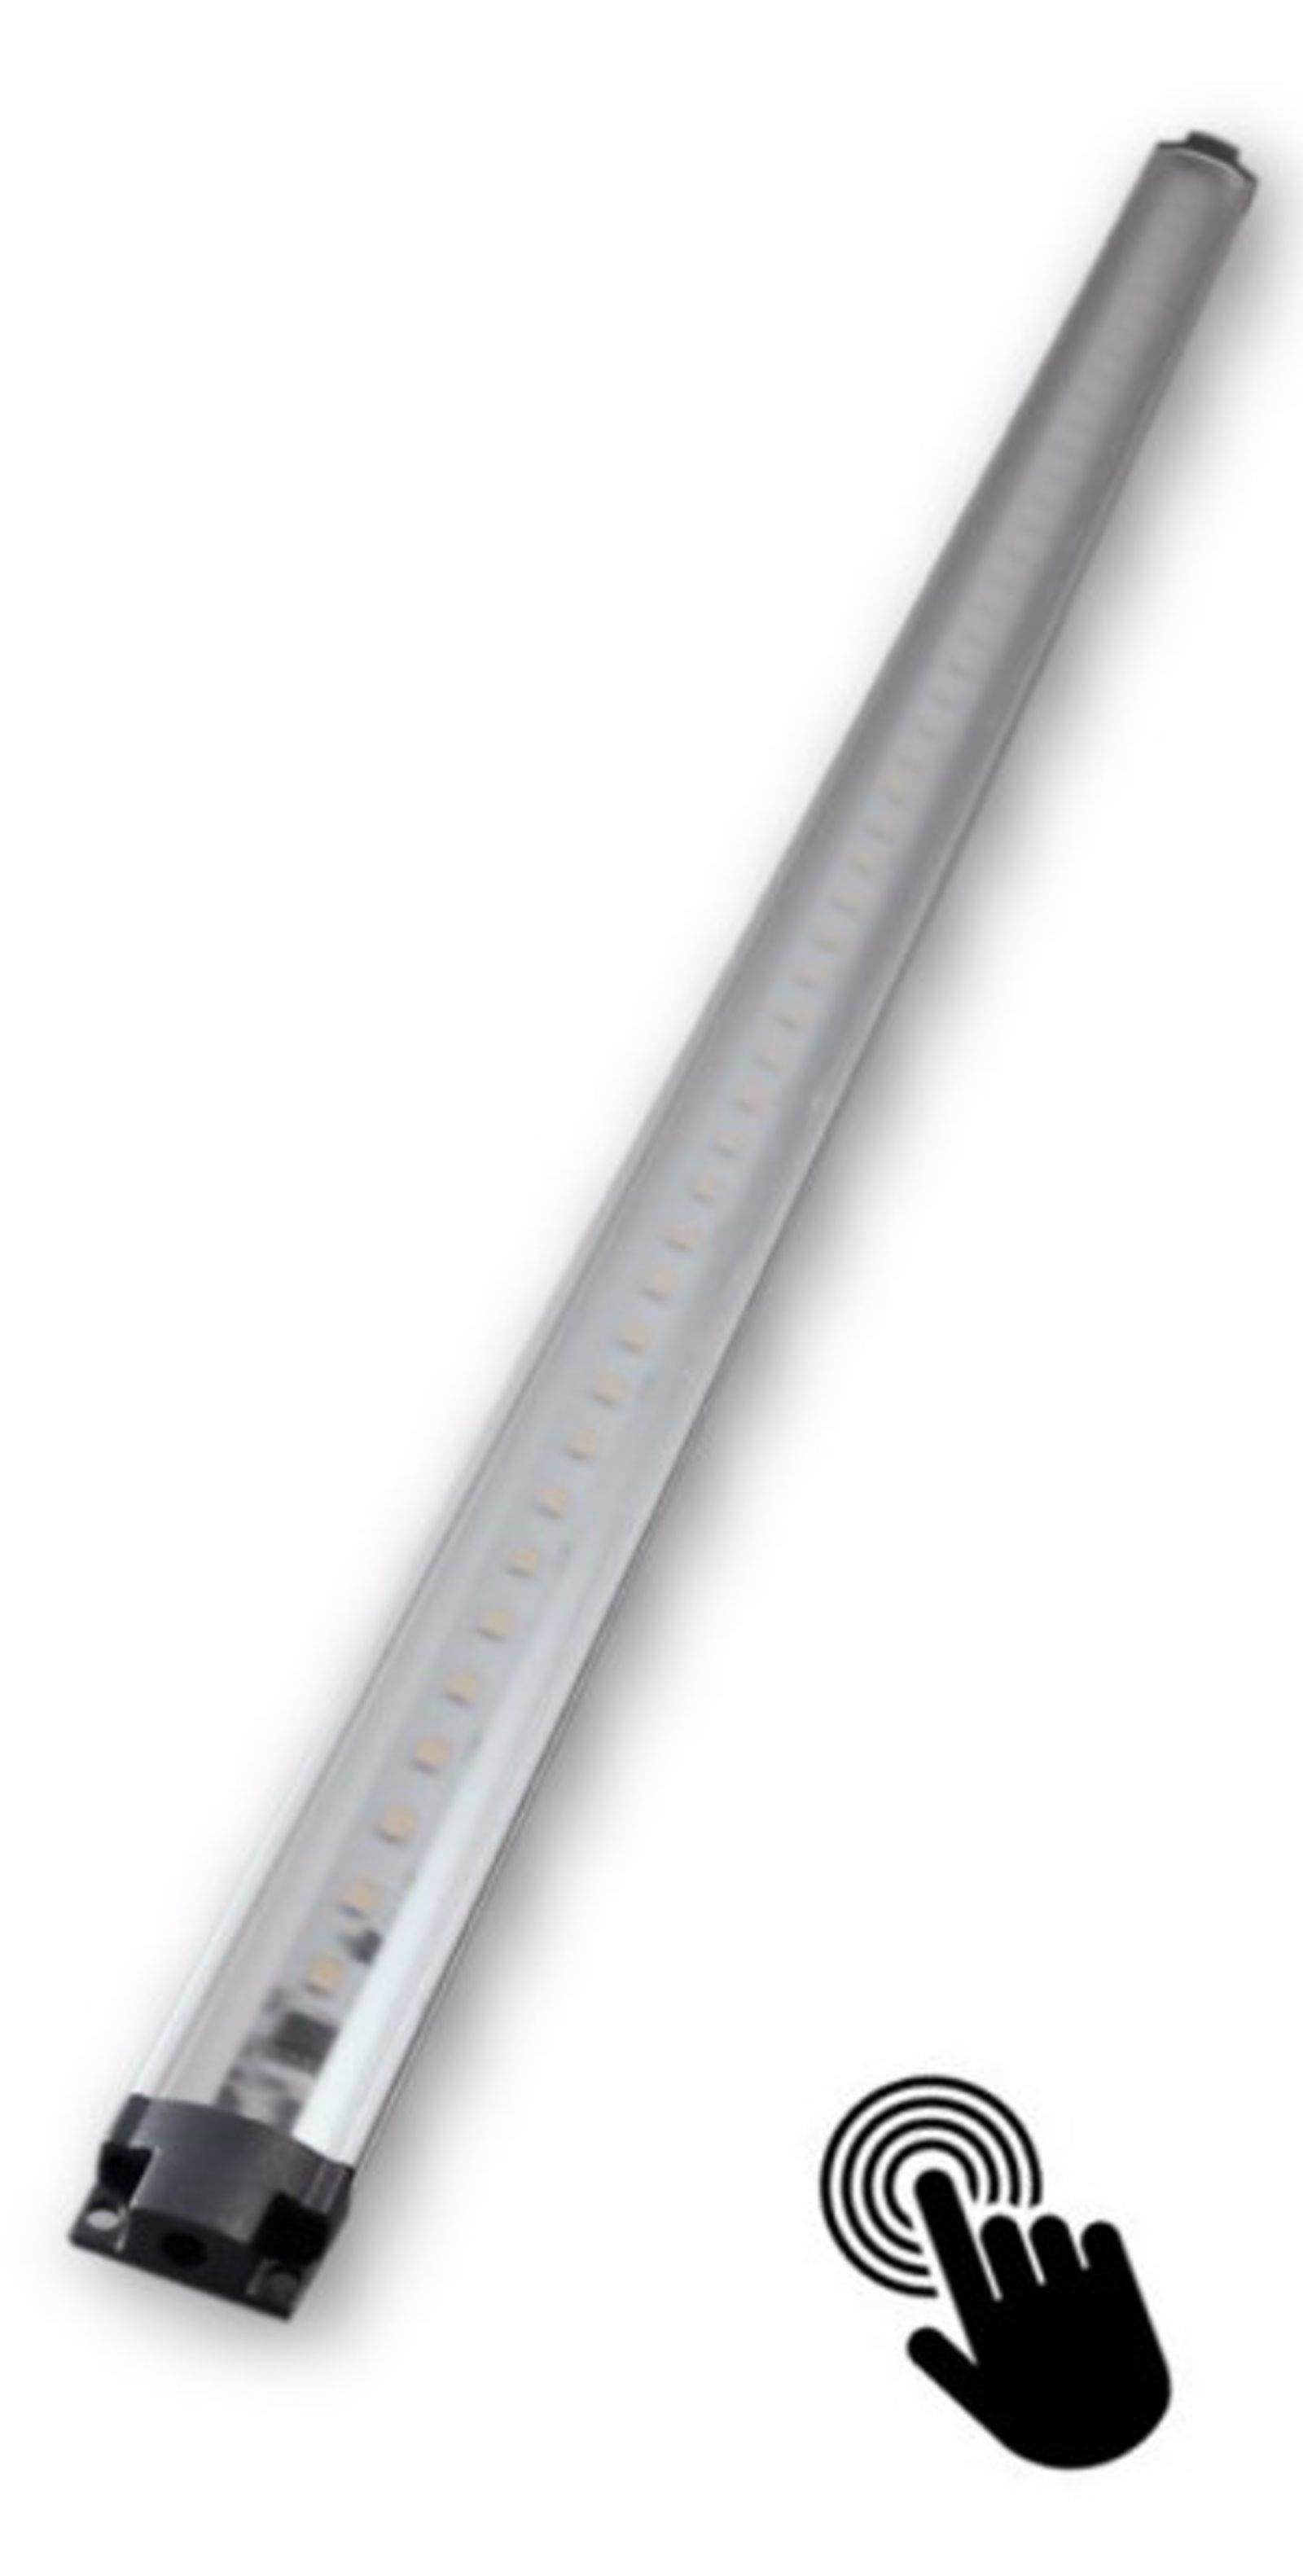 5 m LED Leiste WARMWEISS Lichtleiste Wandlampe Wandleuchte Strahler 230 V Spot